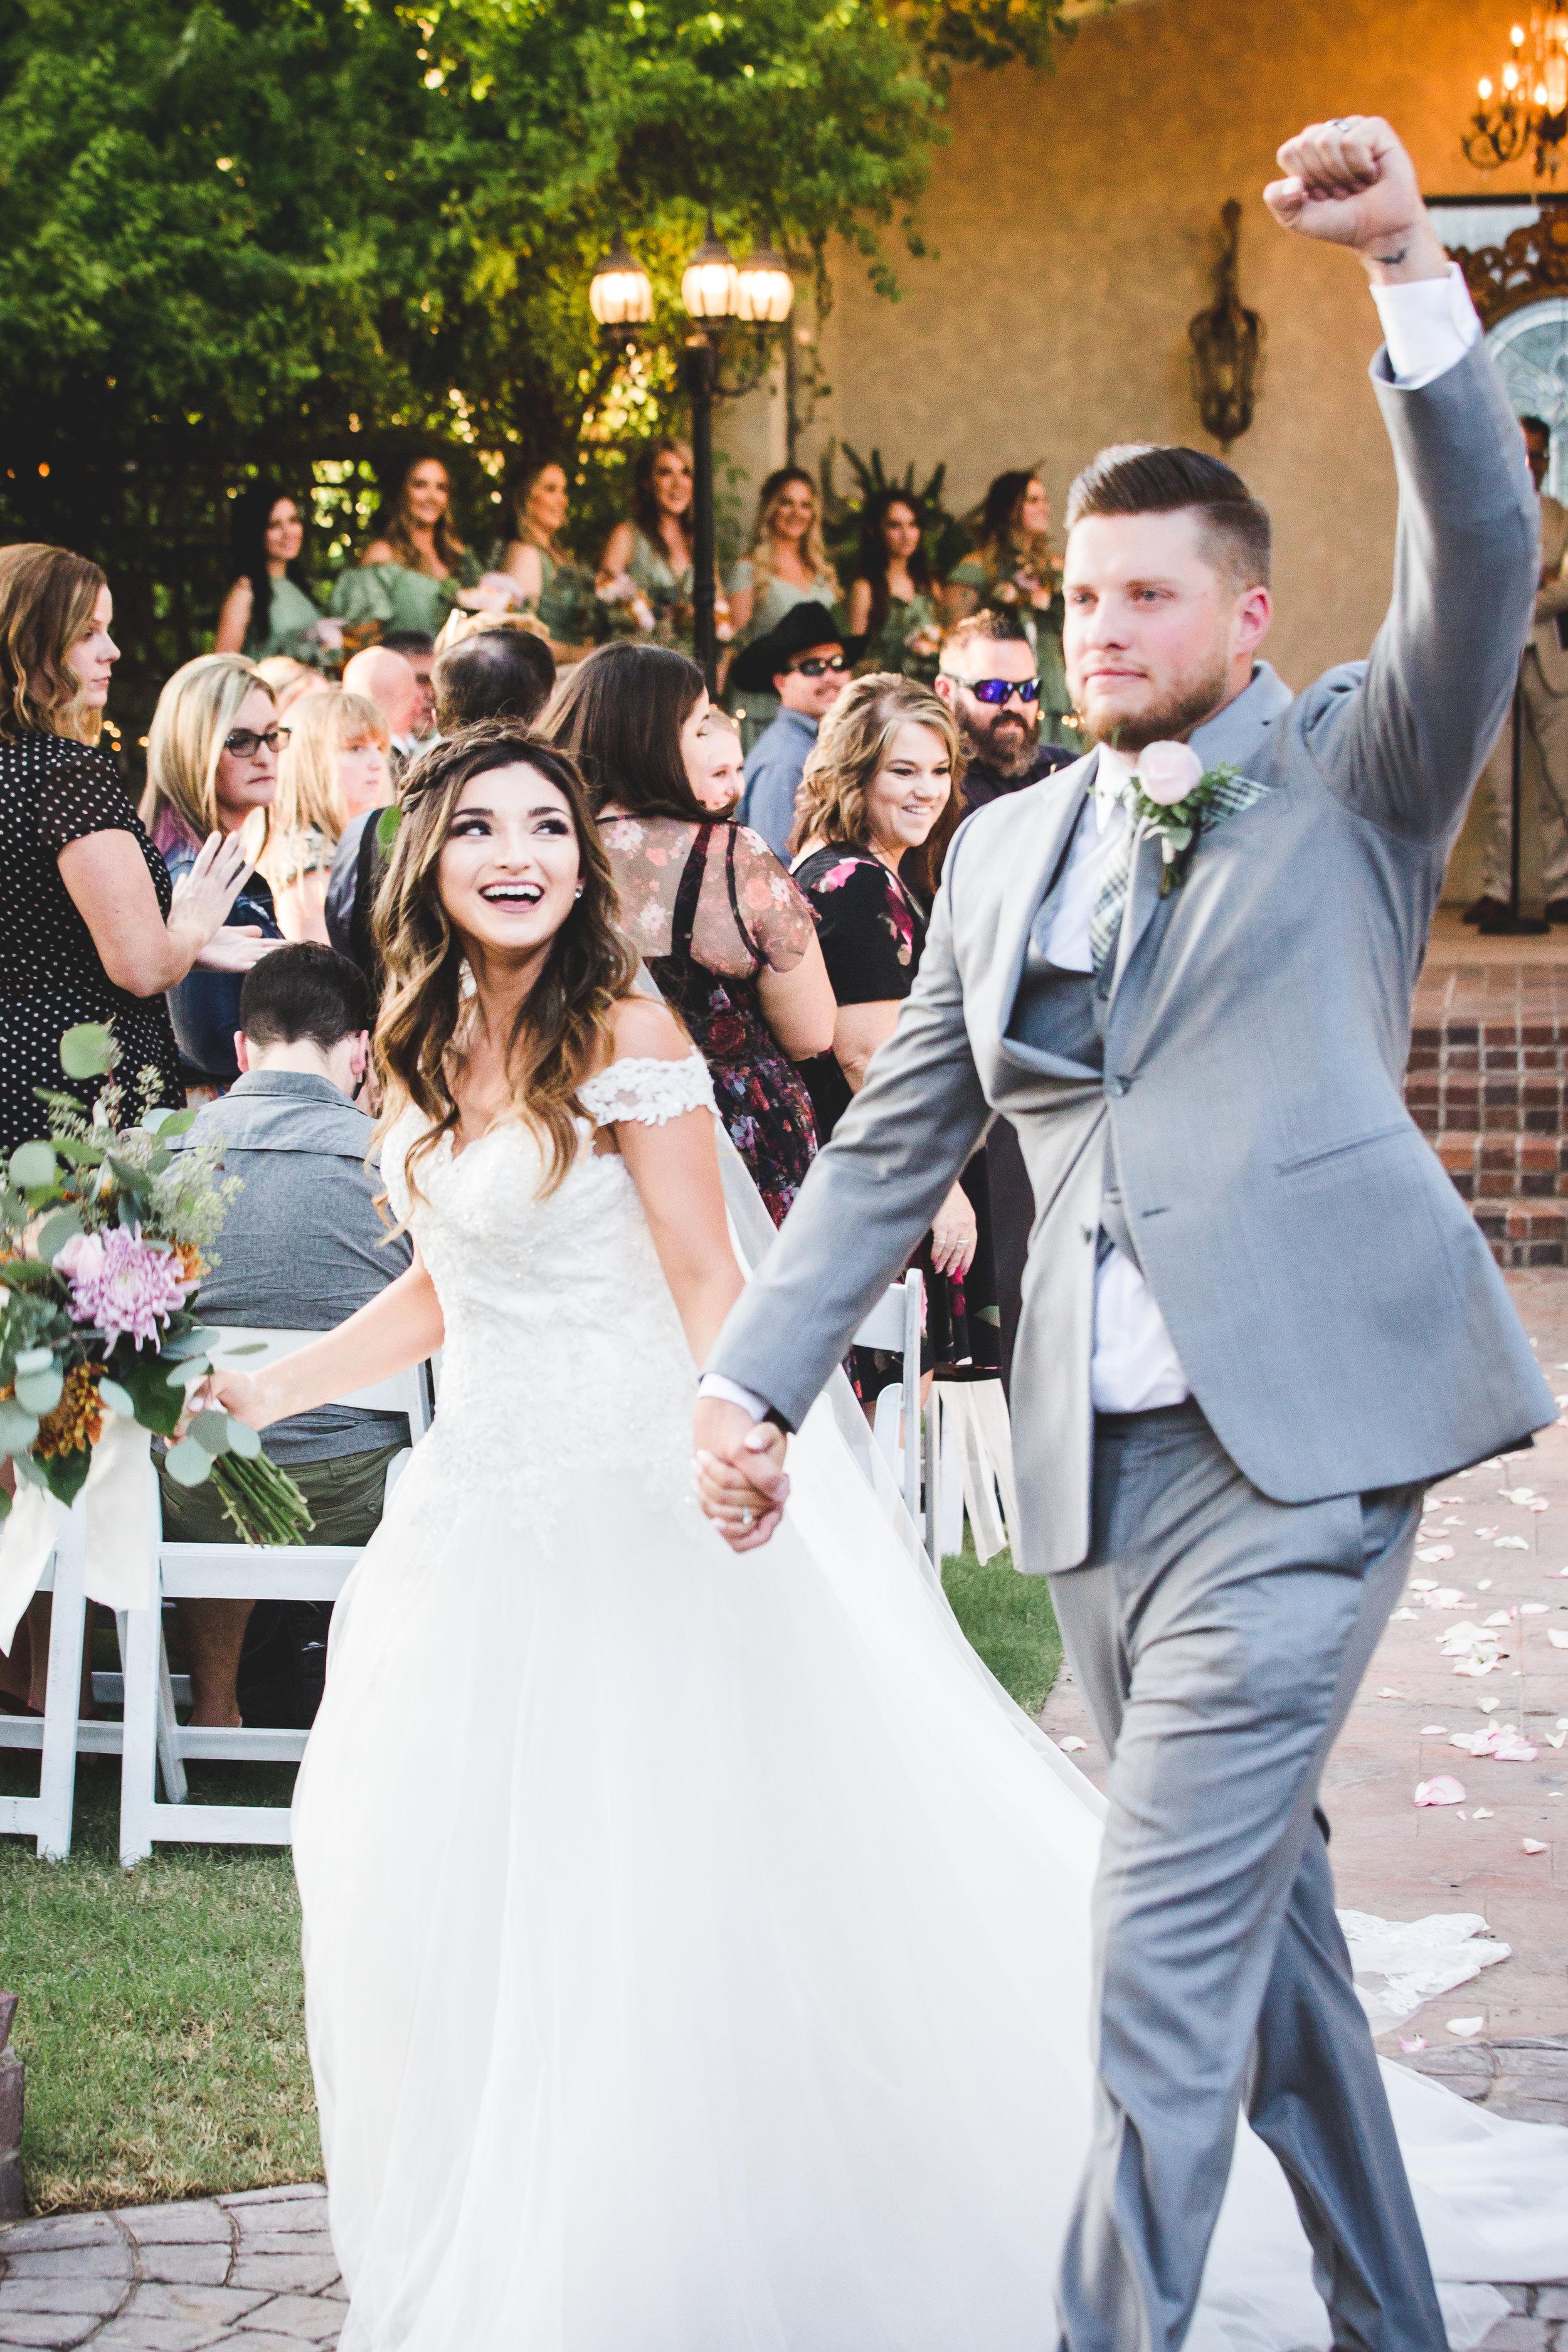 2018-09-07-WEDDING-MCBRIDE-TERRY-204.jpg